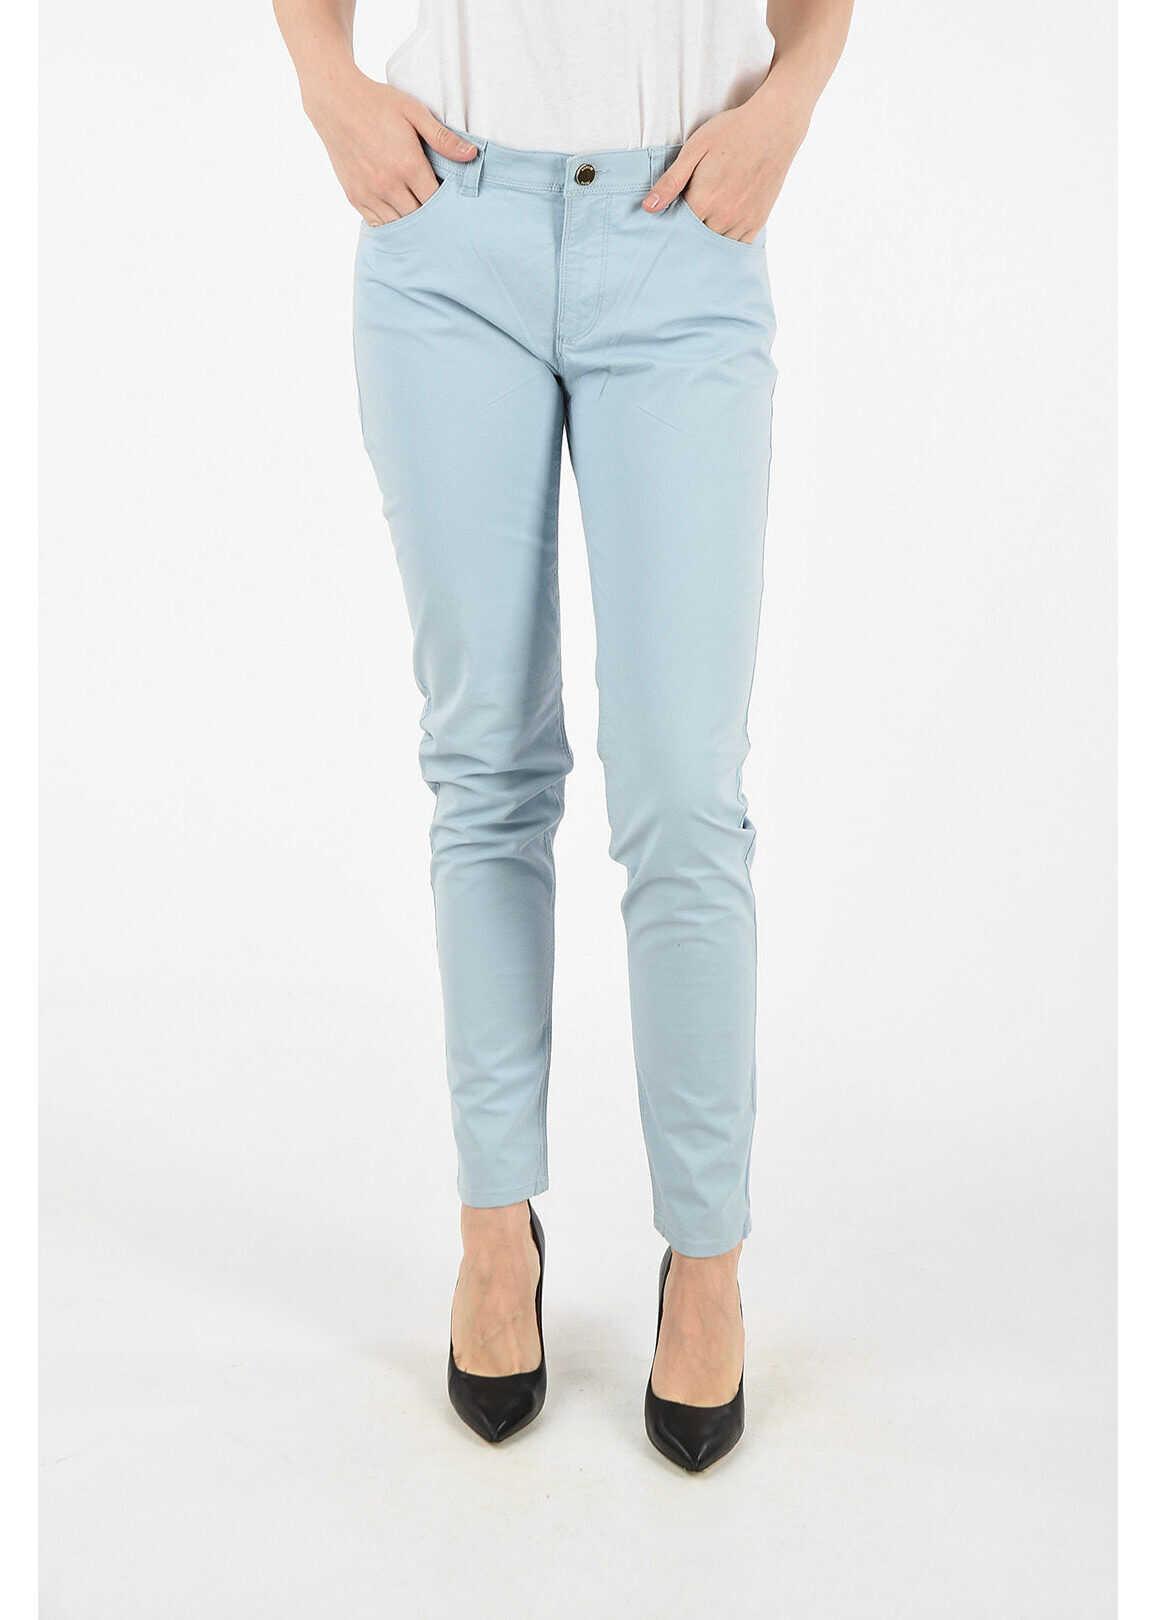 Armani ARMANI JEANS Skinny Fit ORCHID Jeans BLUE